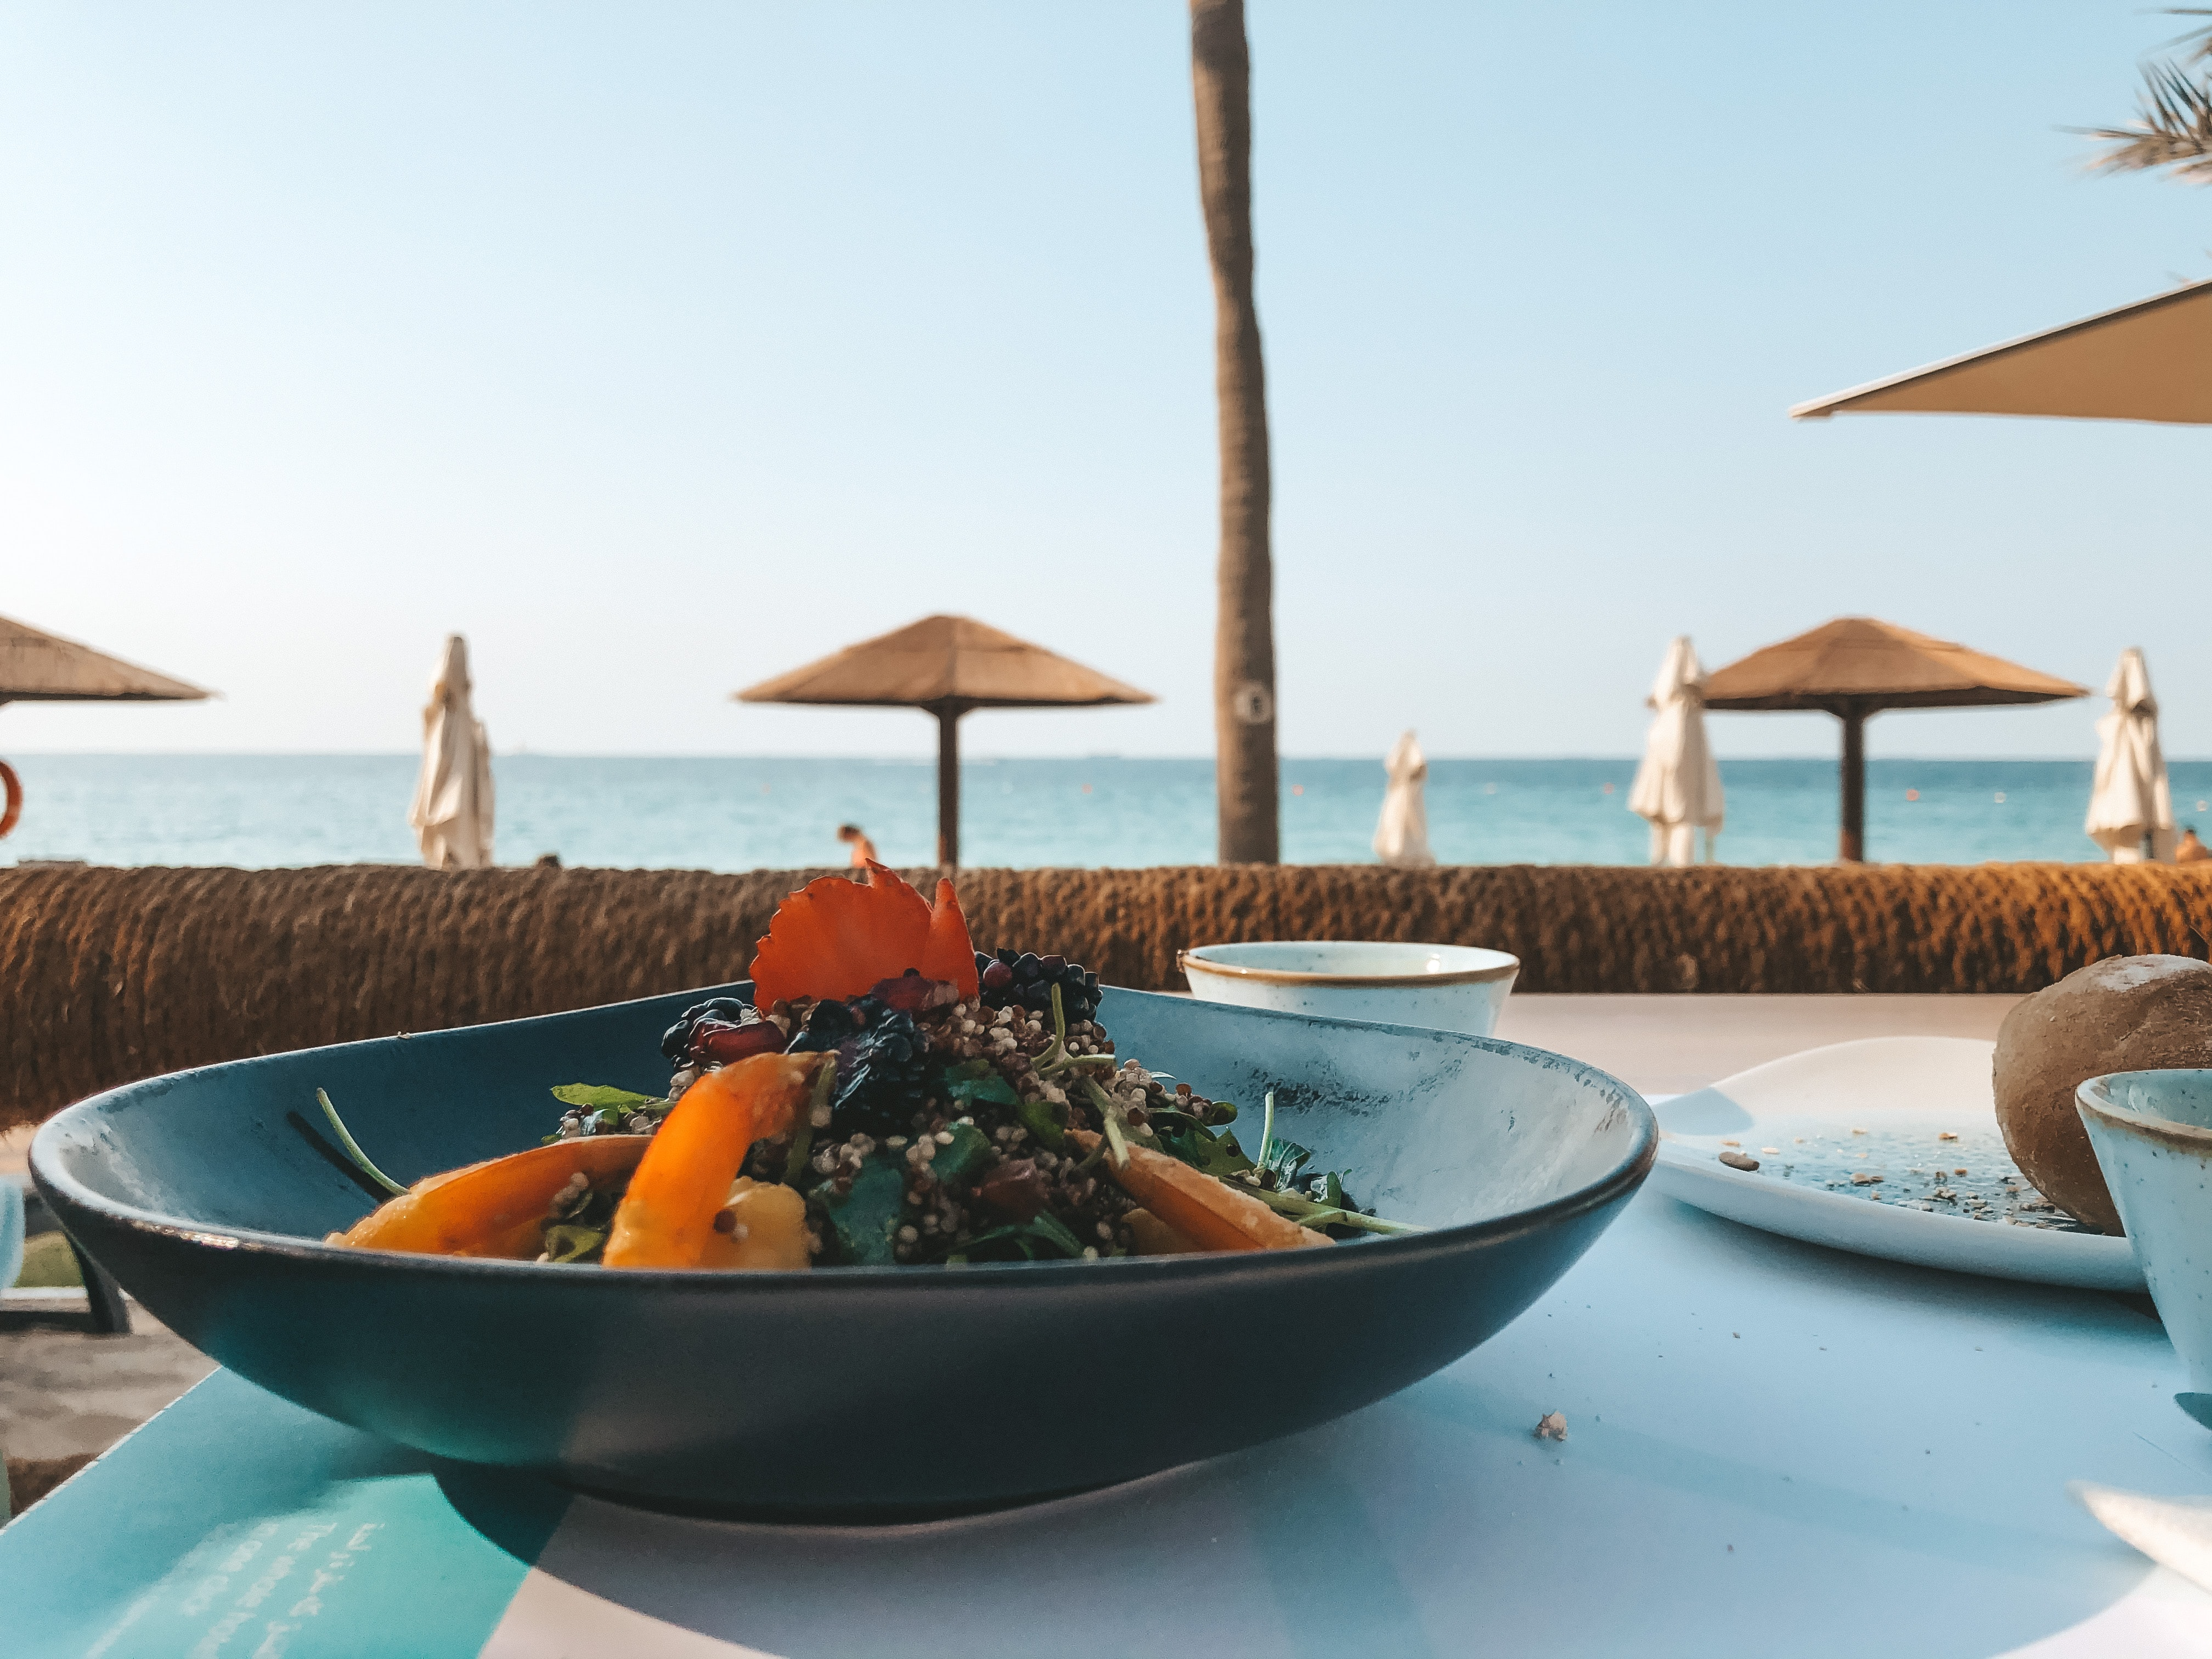 Food In Dubai, Dubai Abu Dhabi tour itinerary